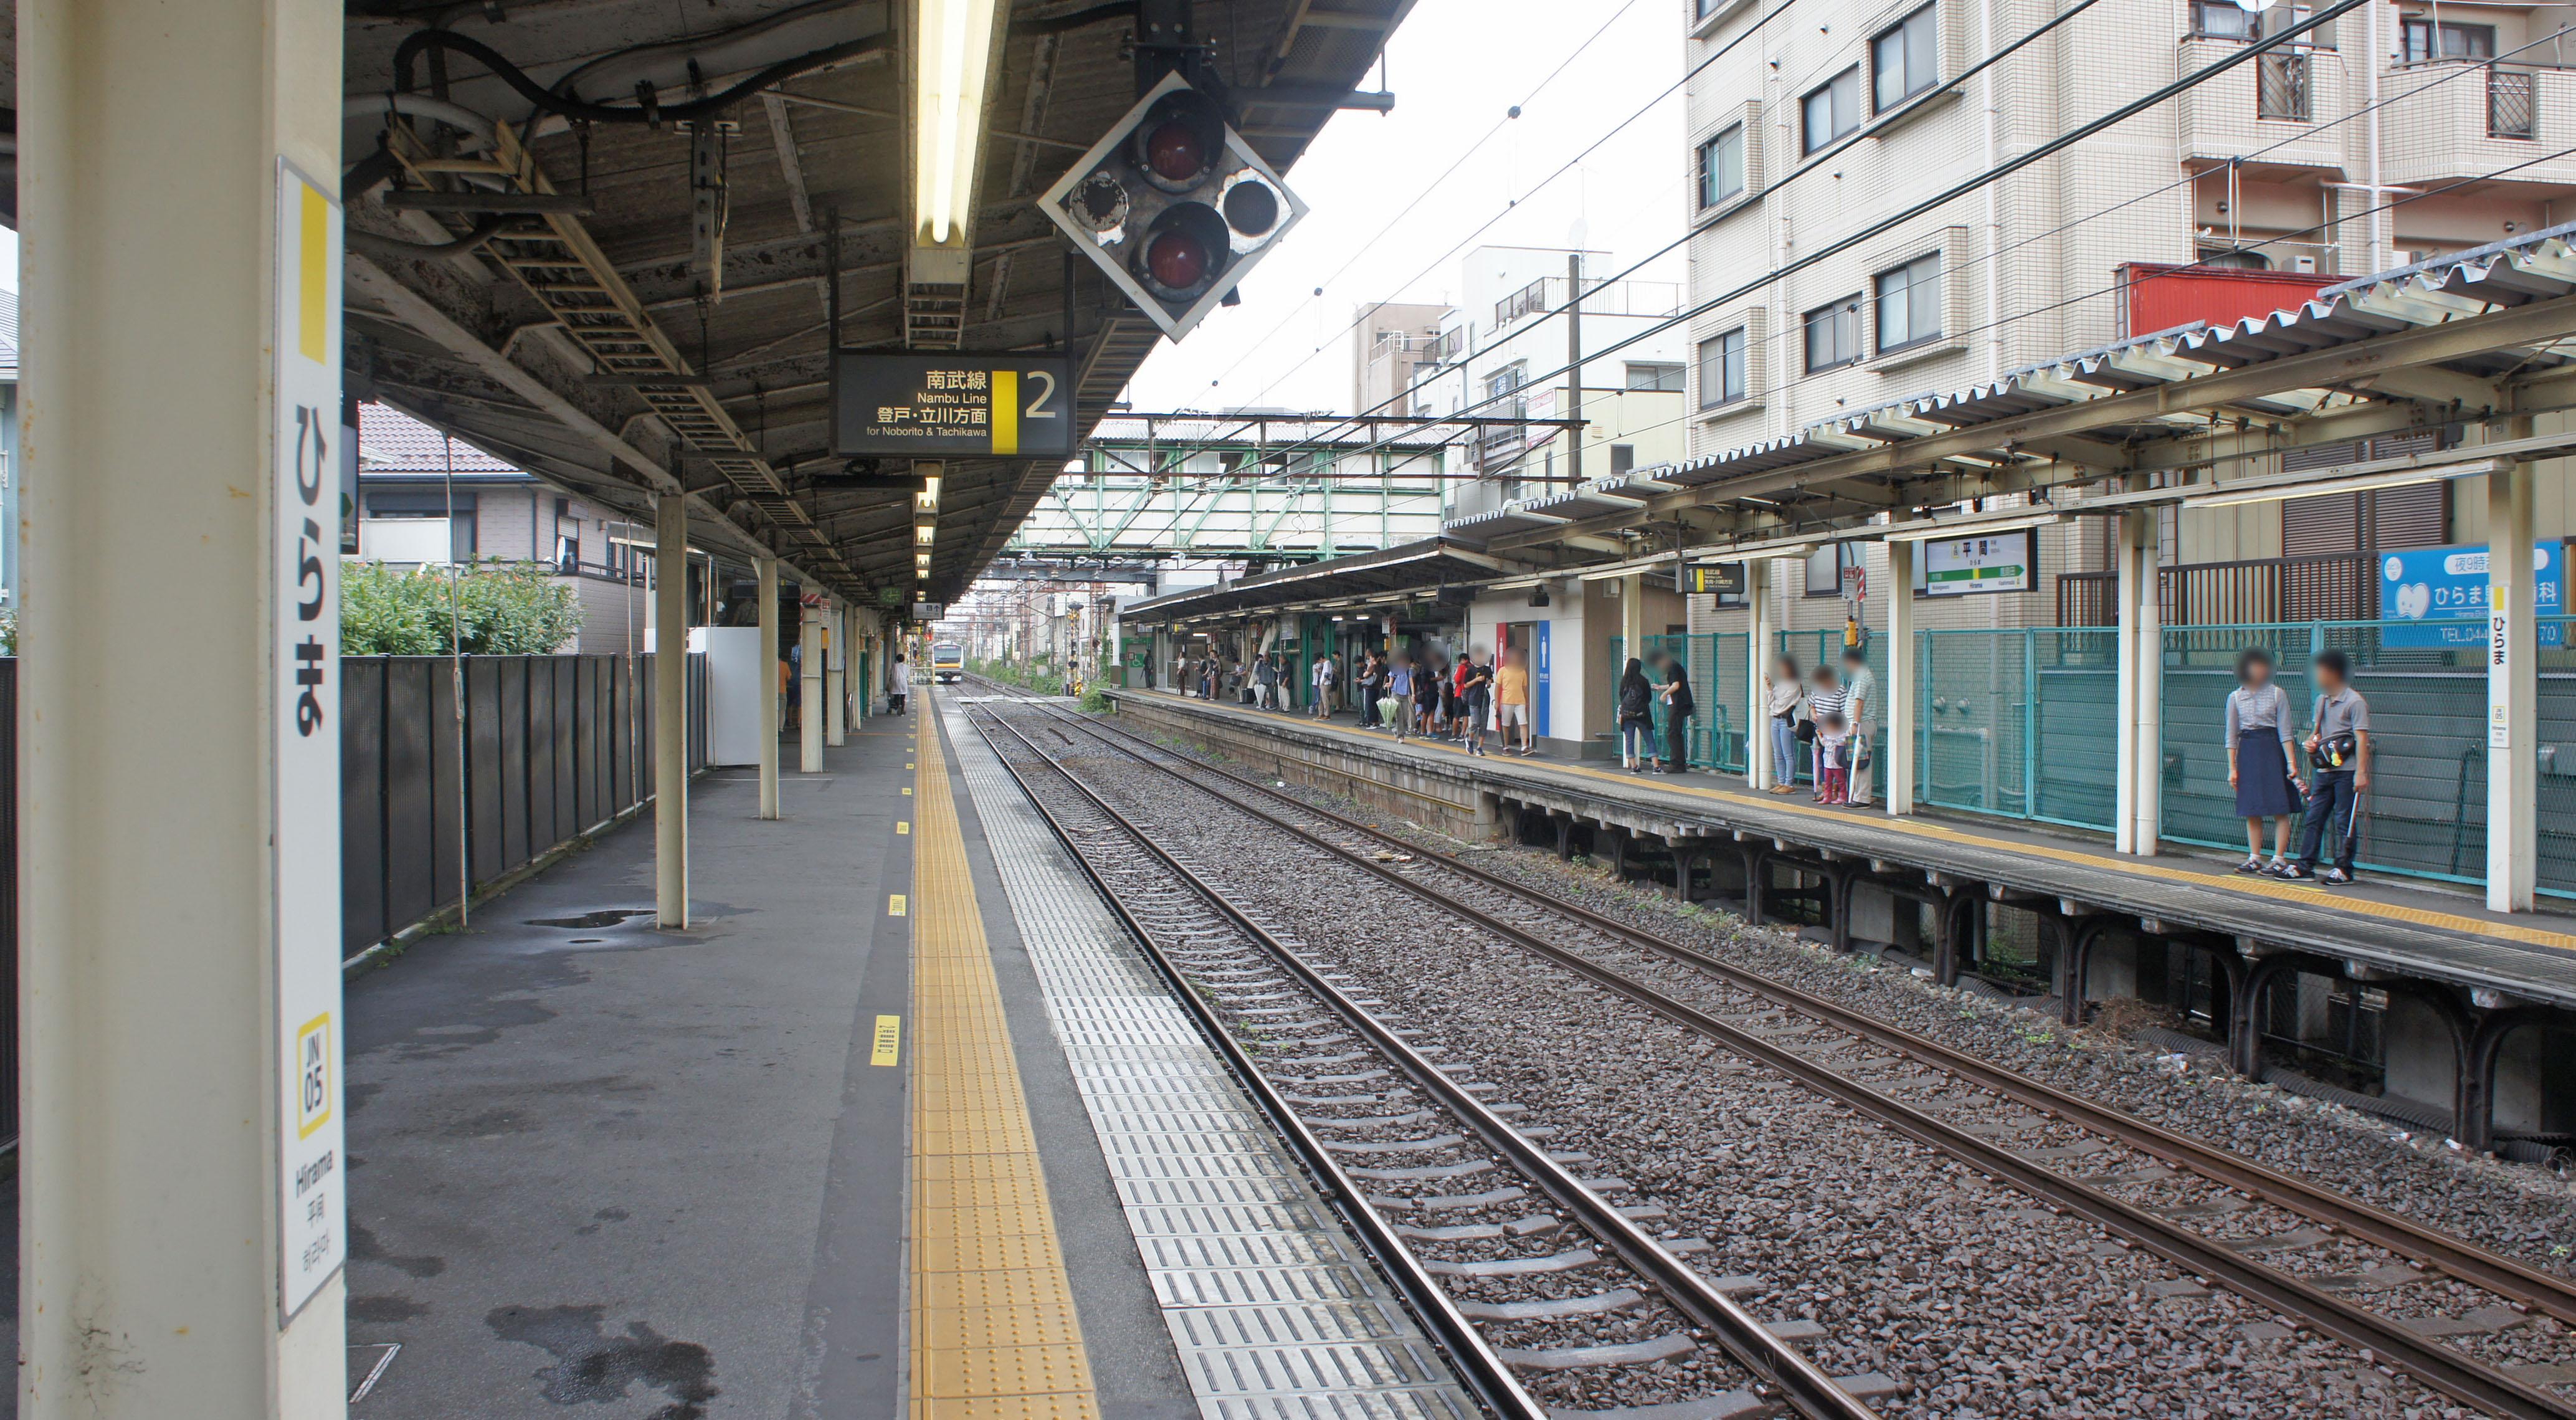 https://upload.wikimedia.org/wikipedia/commons/3/31/JR_Nambu-Line_Hirama_Station_Platform.jpg